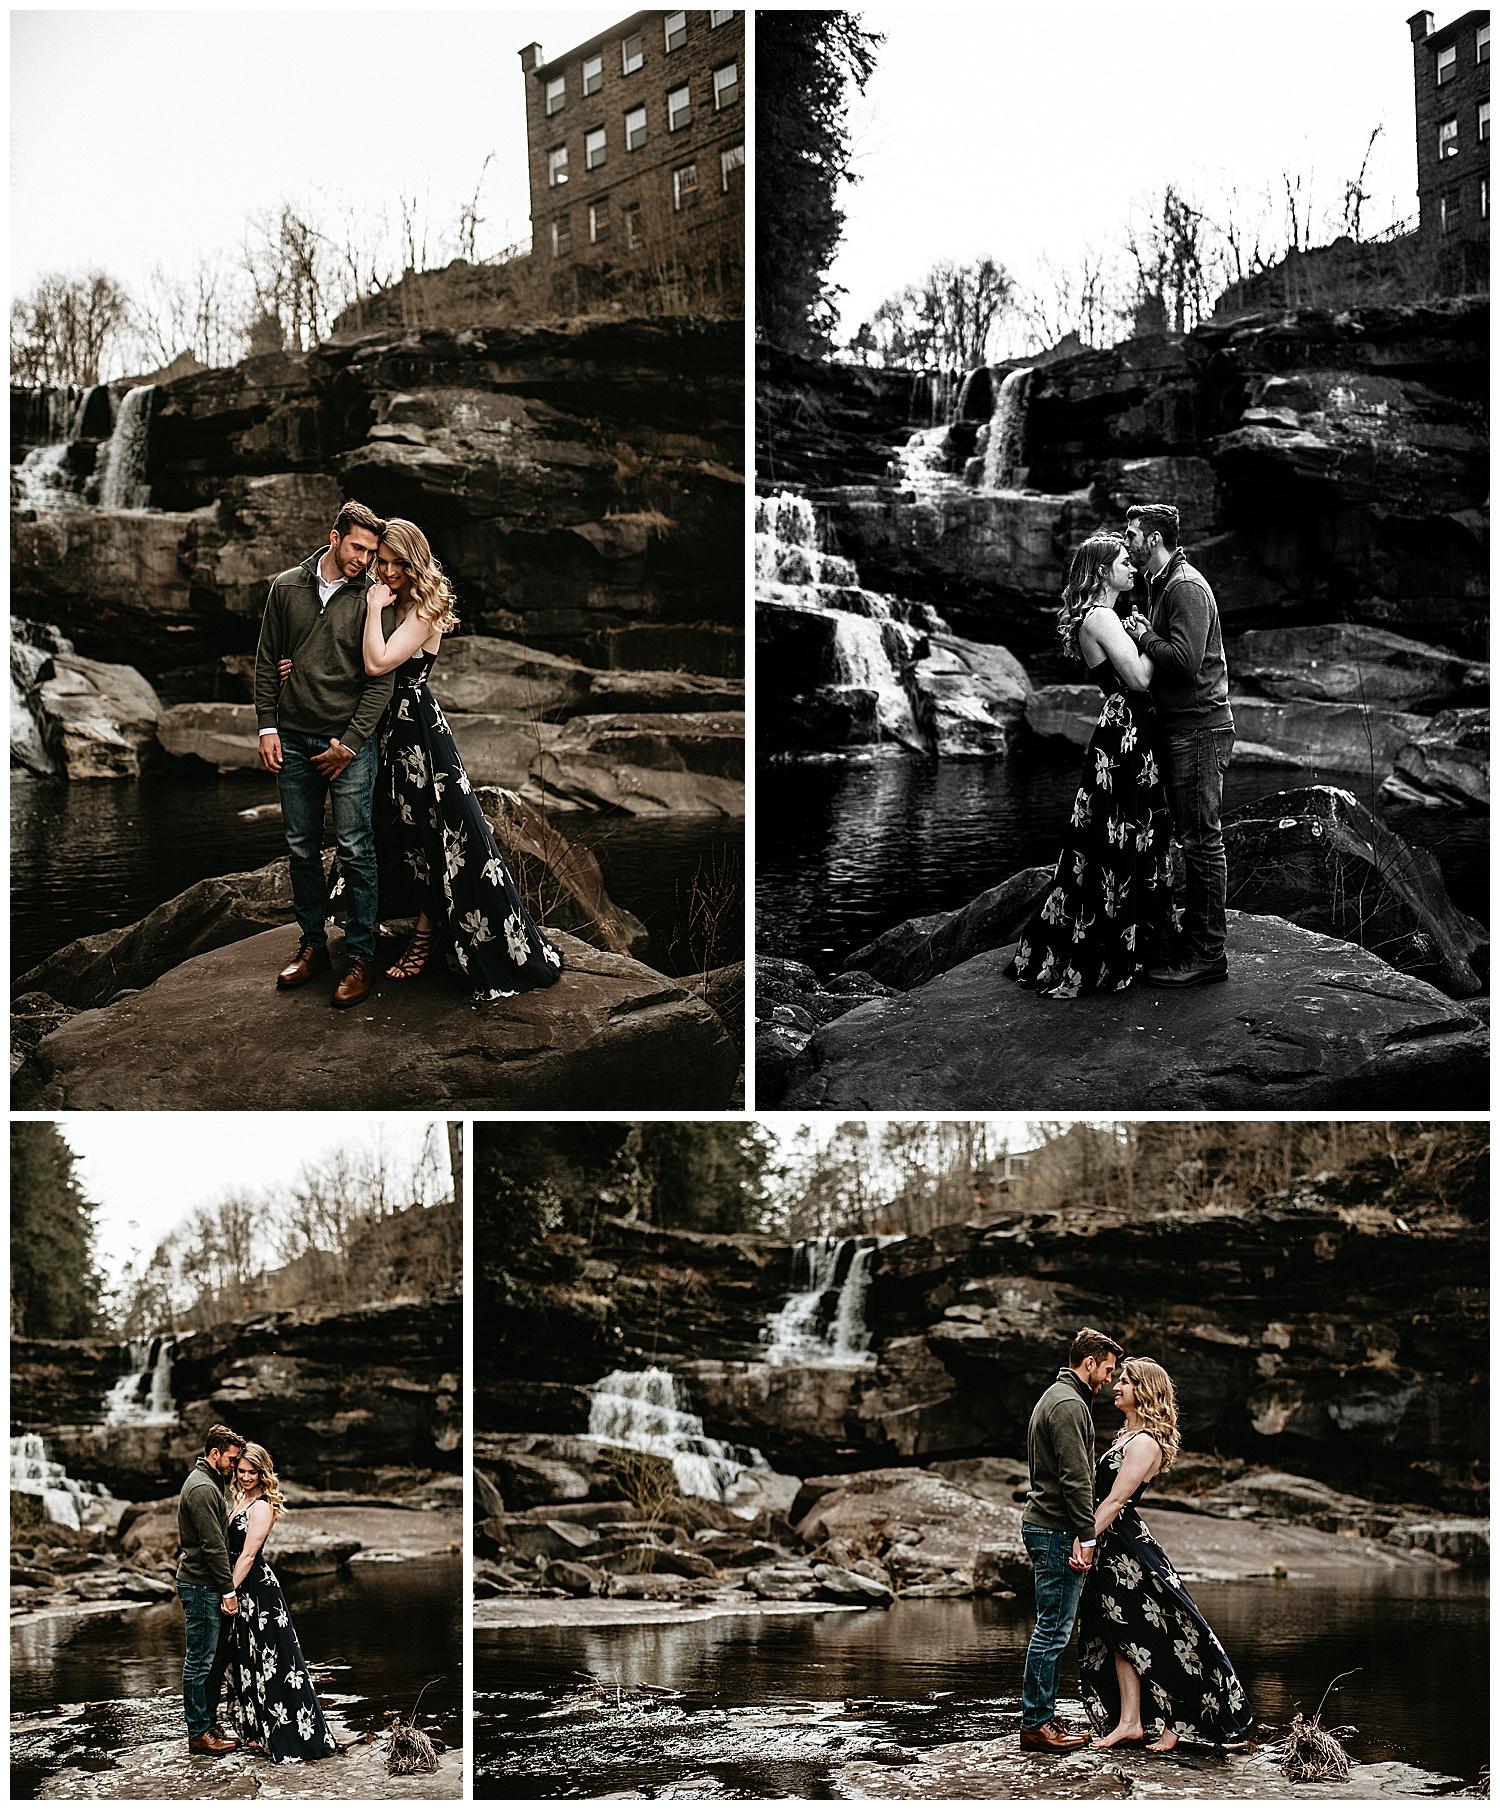 NEPA-Lehigh-Valley-Wedding-Photographer-Ledges-Hotel-Hawley-PA_0016.jpg